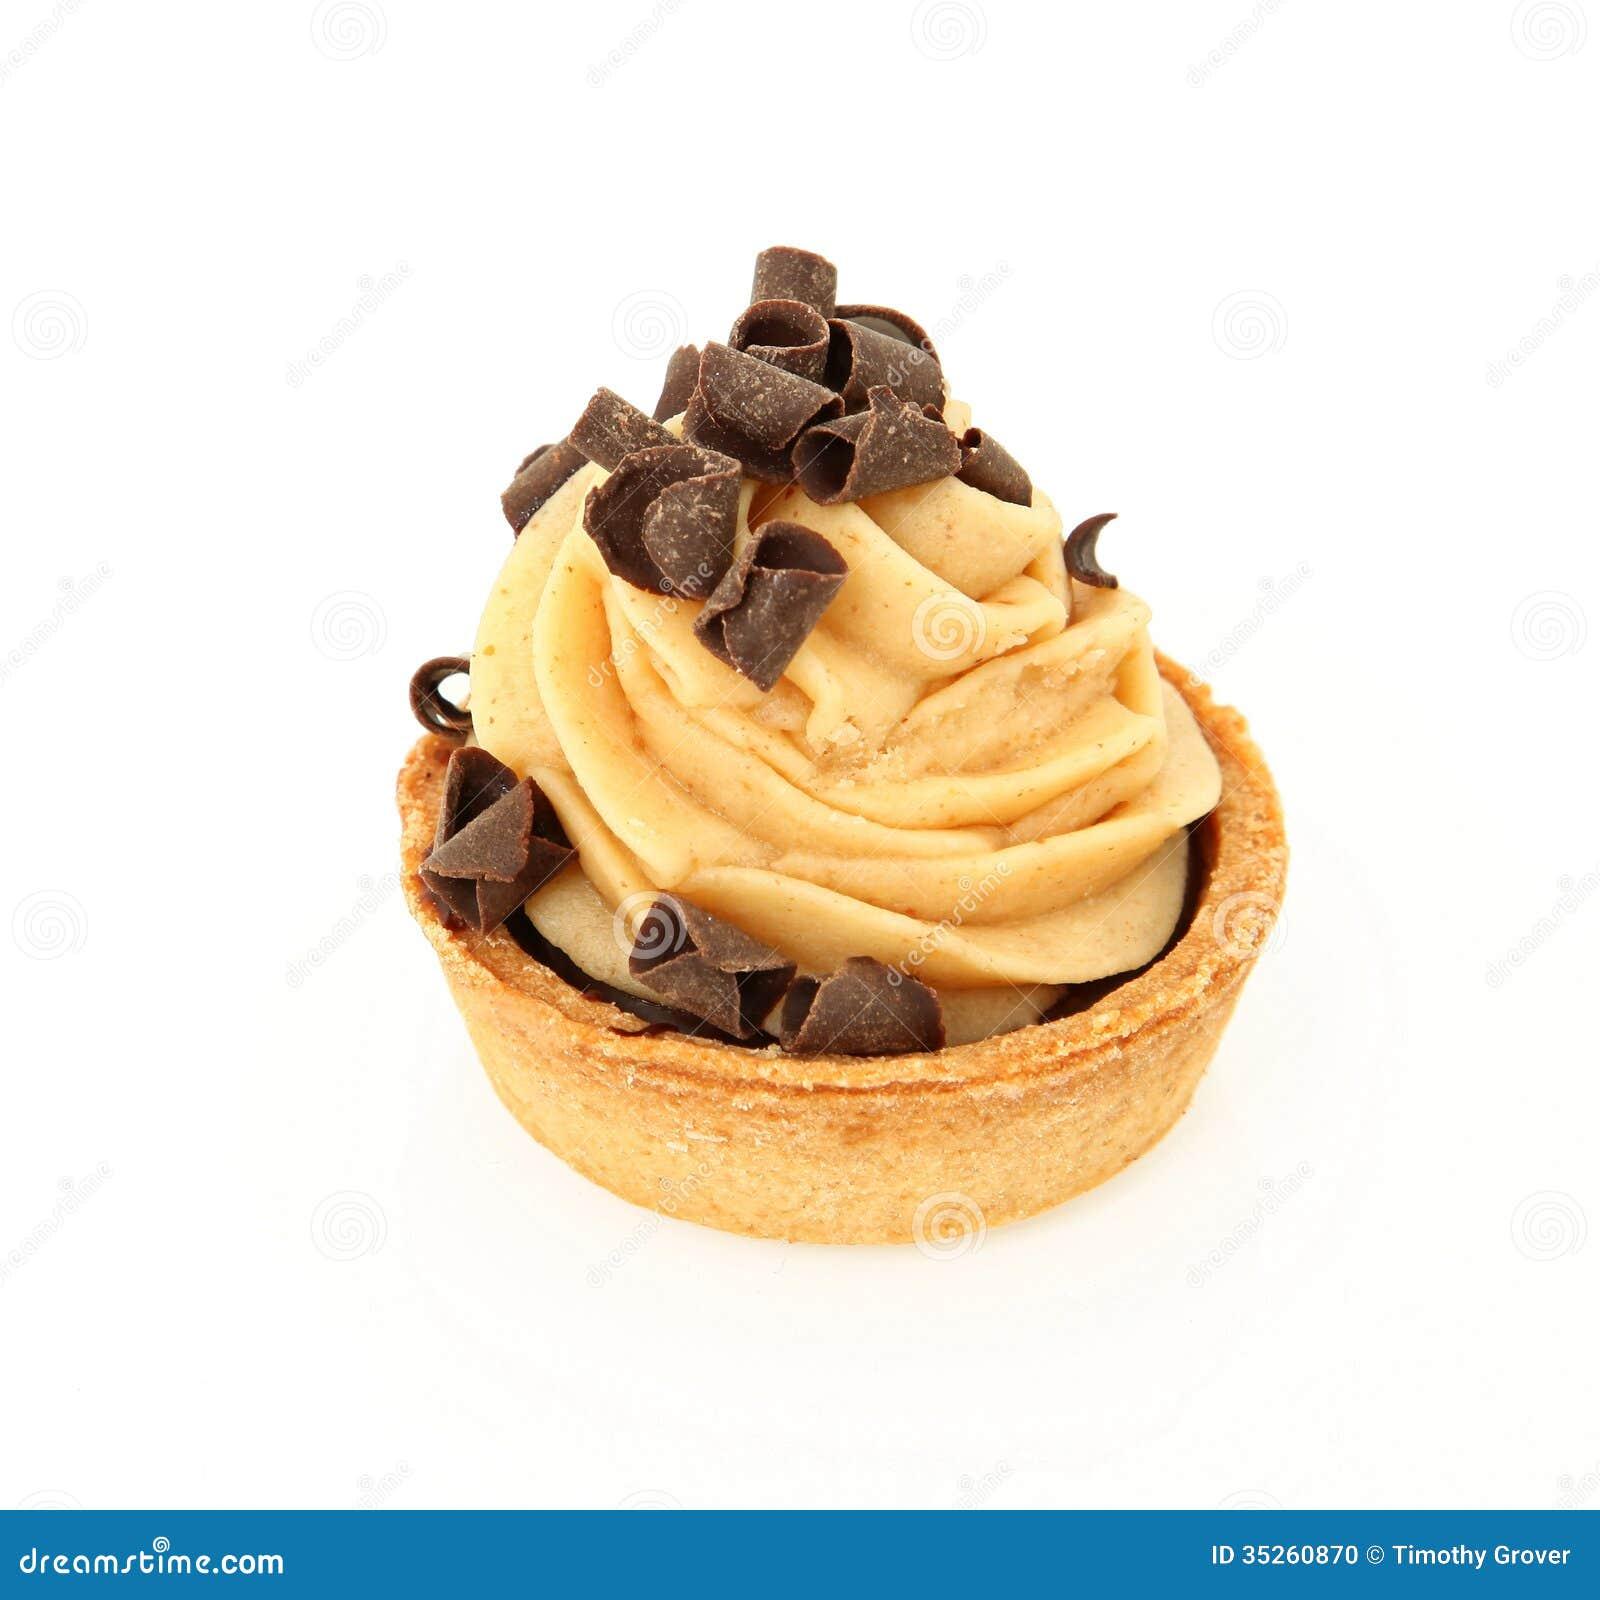 Chocolate Peanut Butter Tart Stock Photo - Image: 35260870